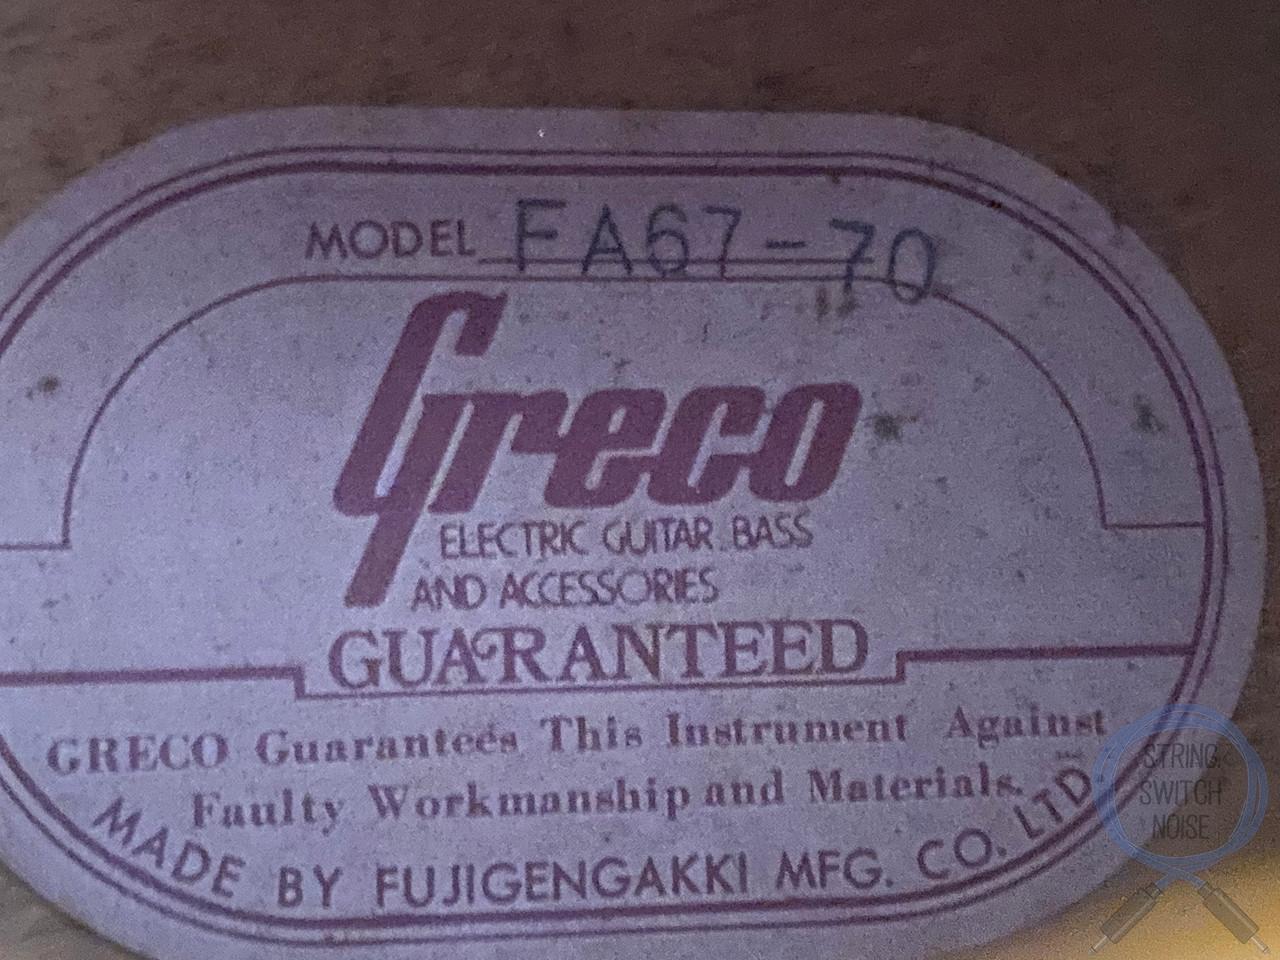 Greco, ES175, Super Real, Full Hollow Body, Sunburst, 1986